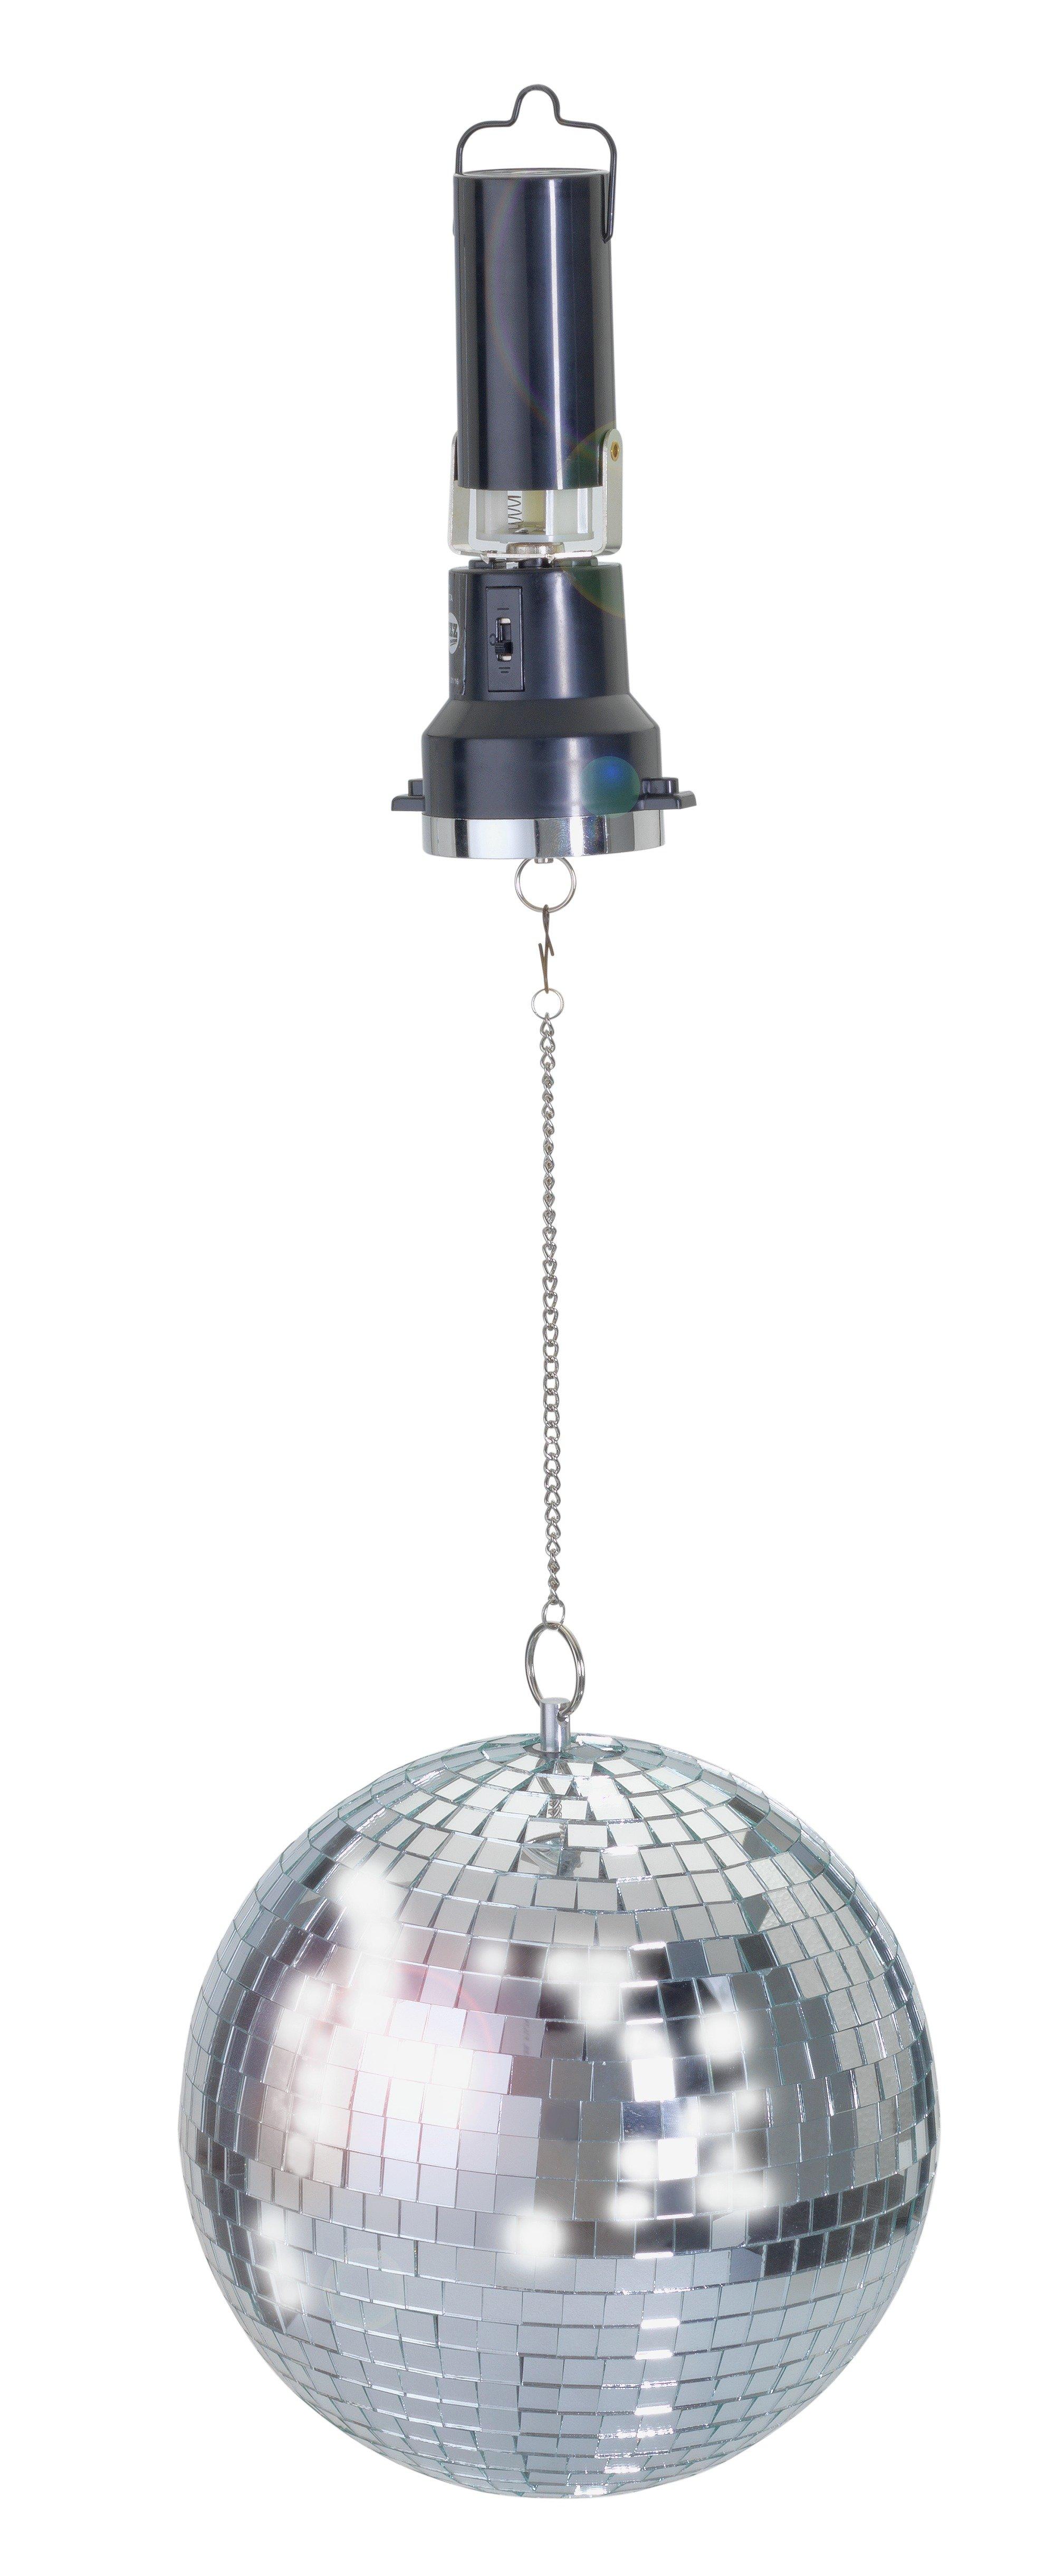 LED Hanging Disco Ball Light - Multicoloured